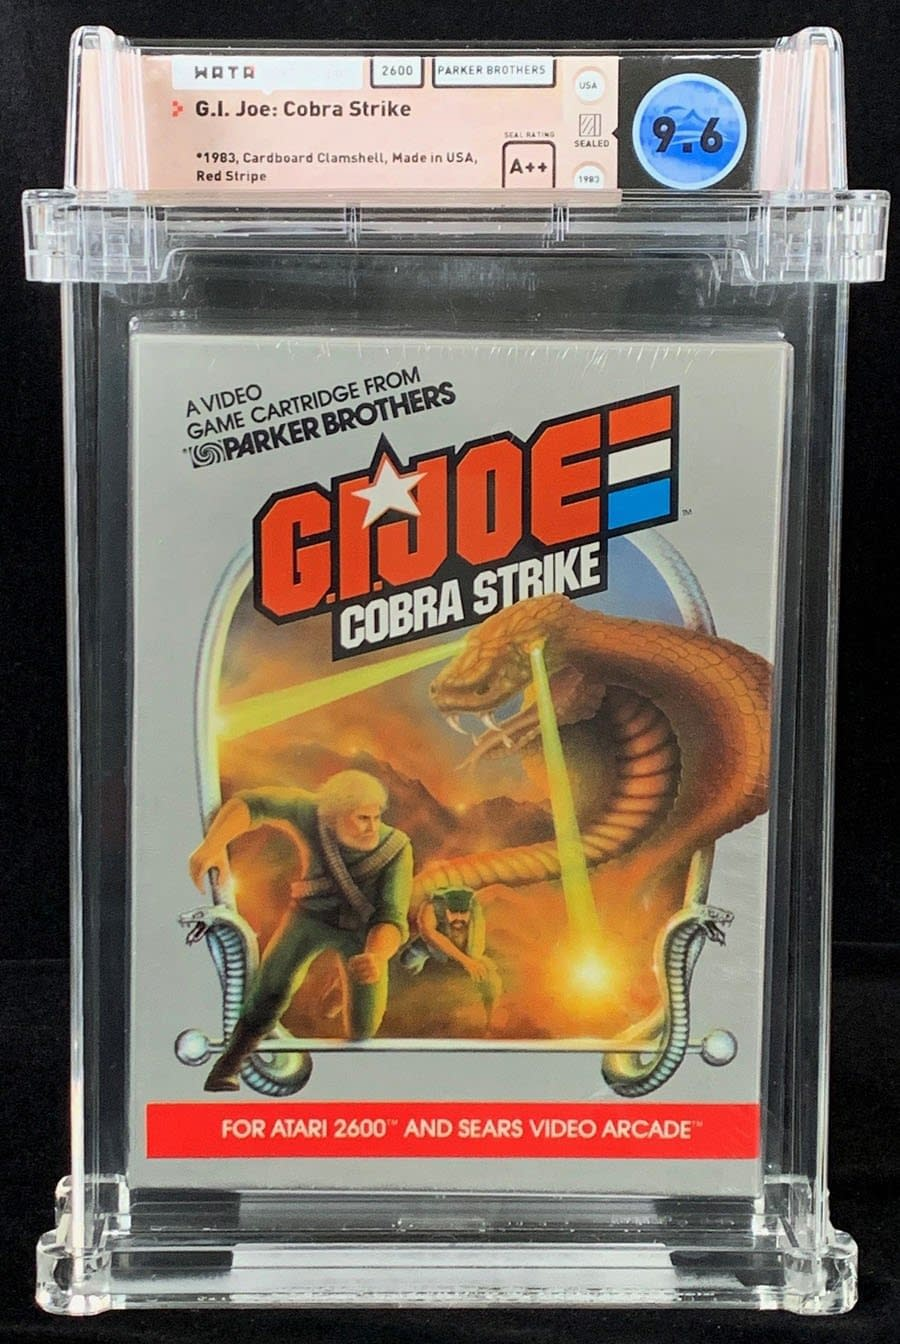 GI Joe: Cobra Strike Graded Atari Game Up For Auction At ComicConnect